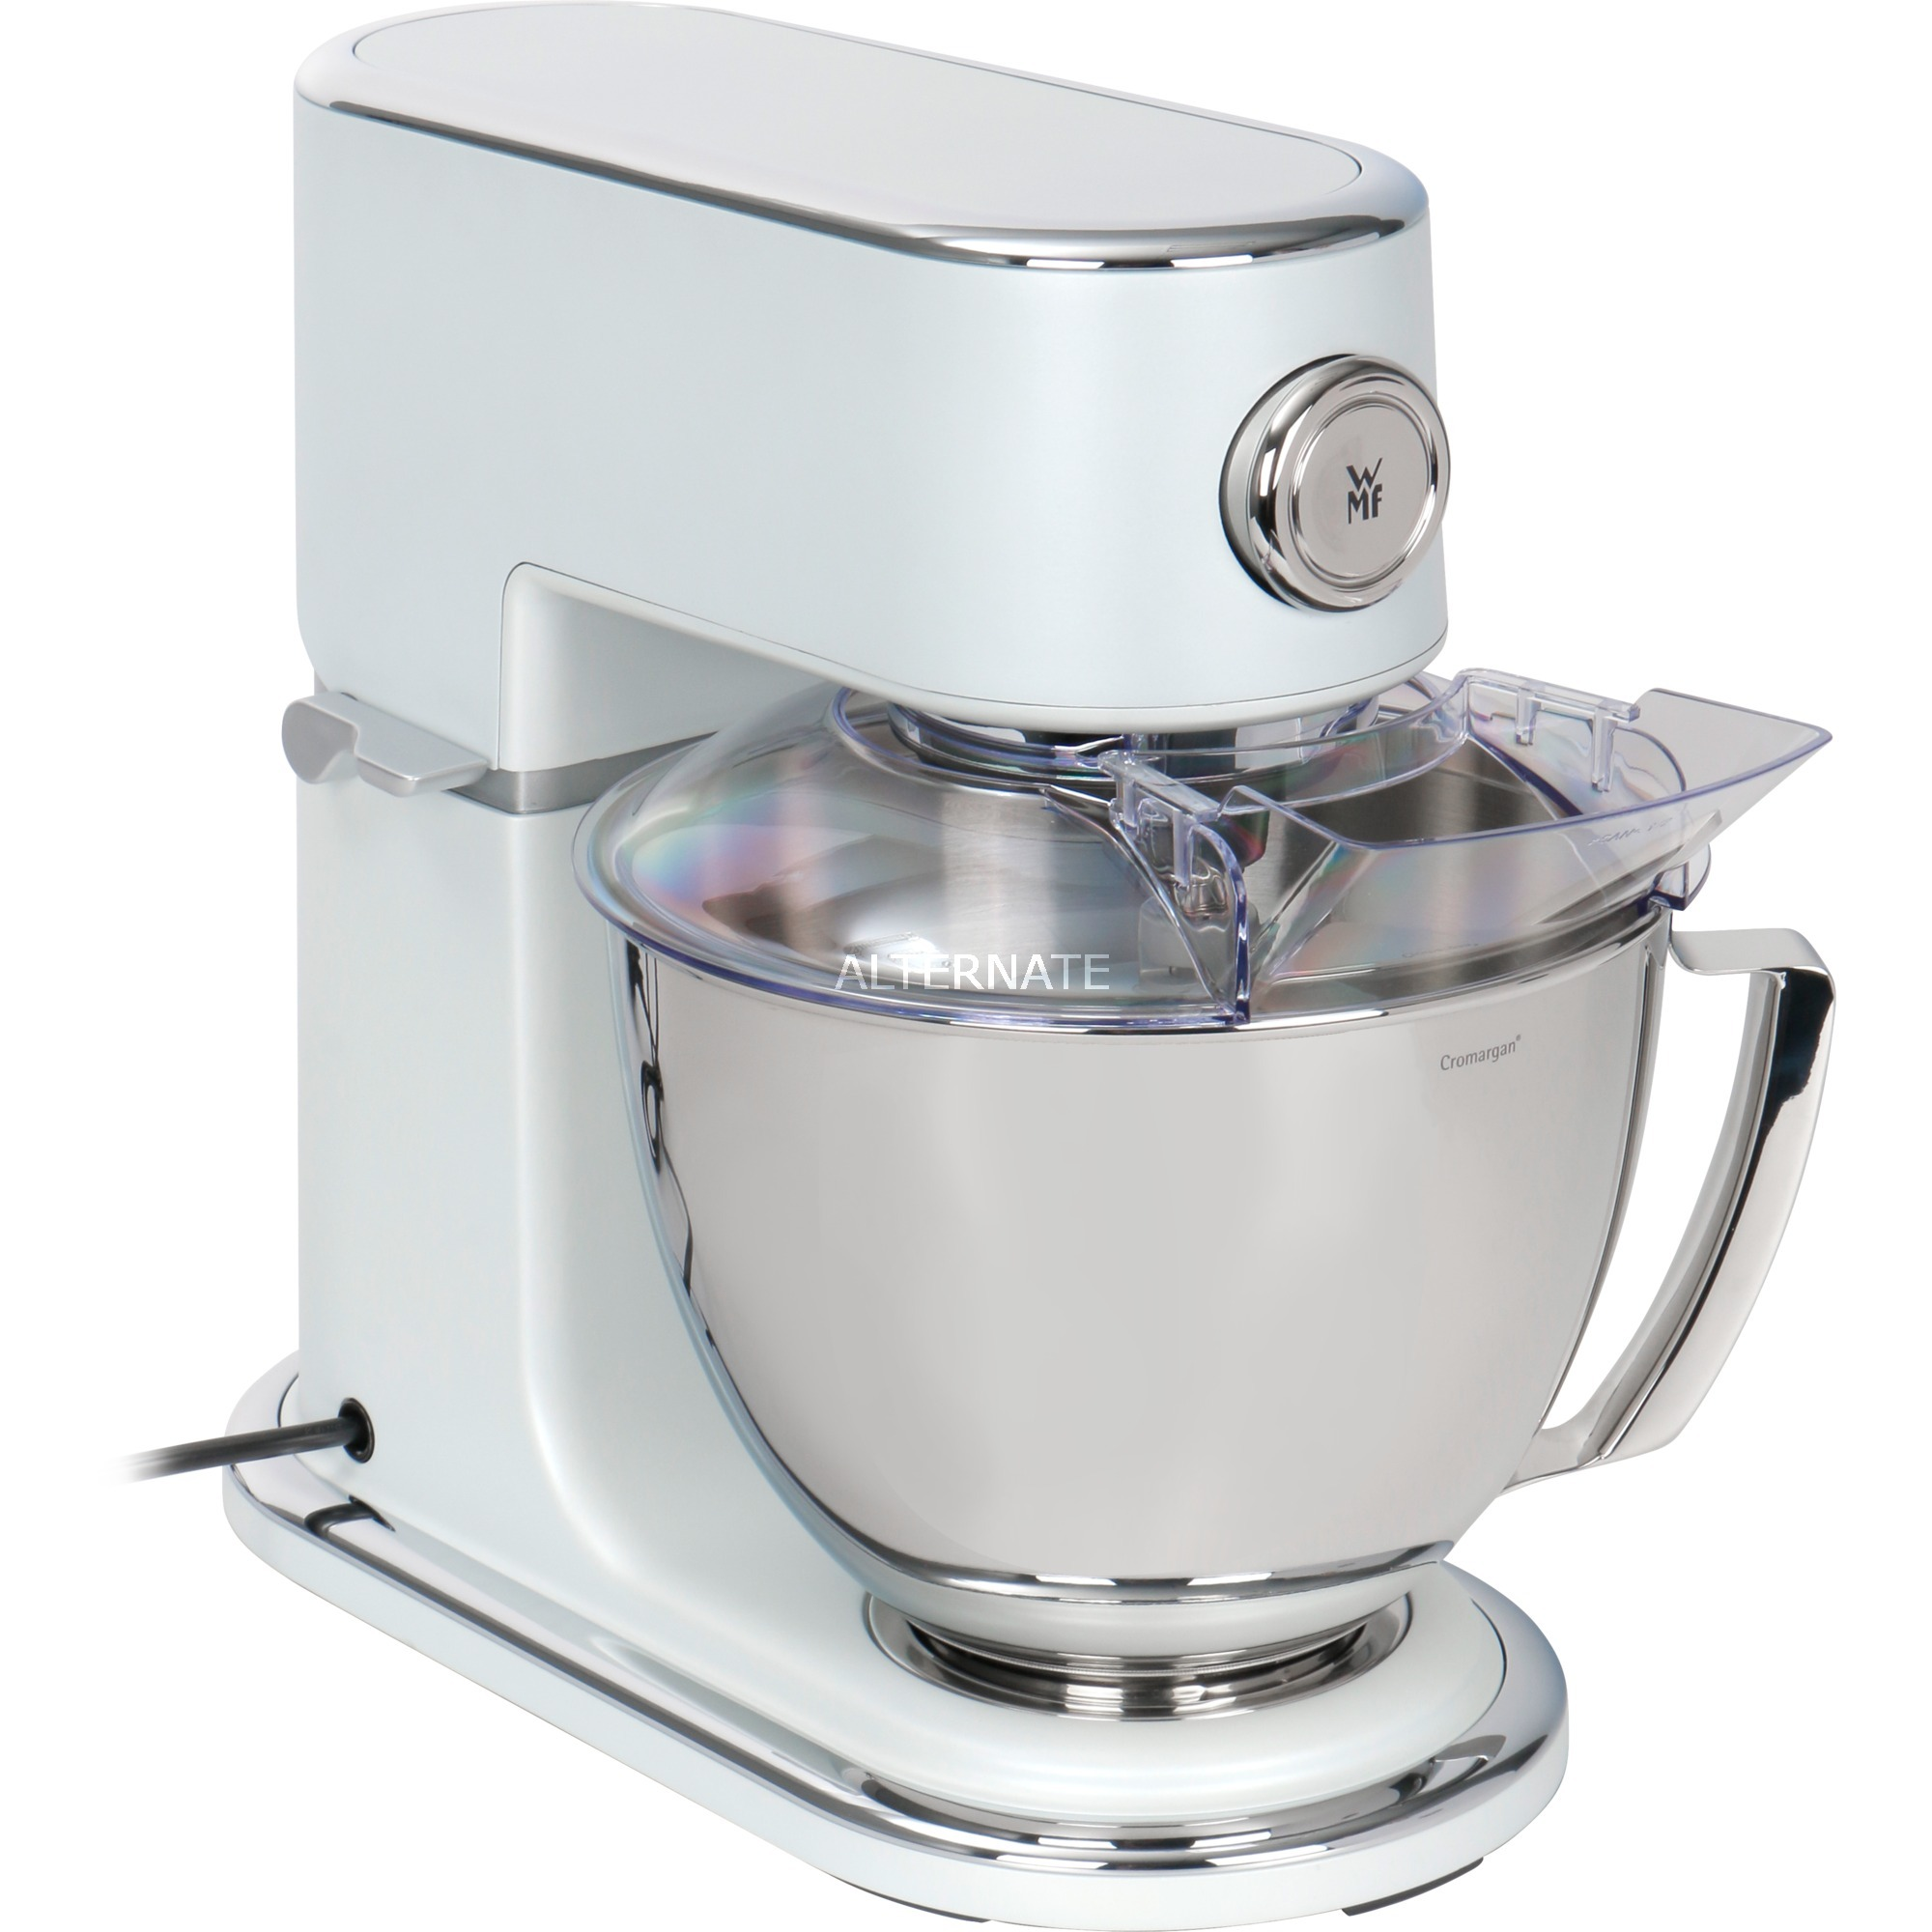 04 1632 0001 robot de cocina 5 L Blanco 1000 W